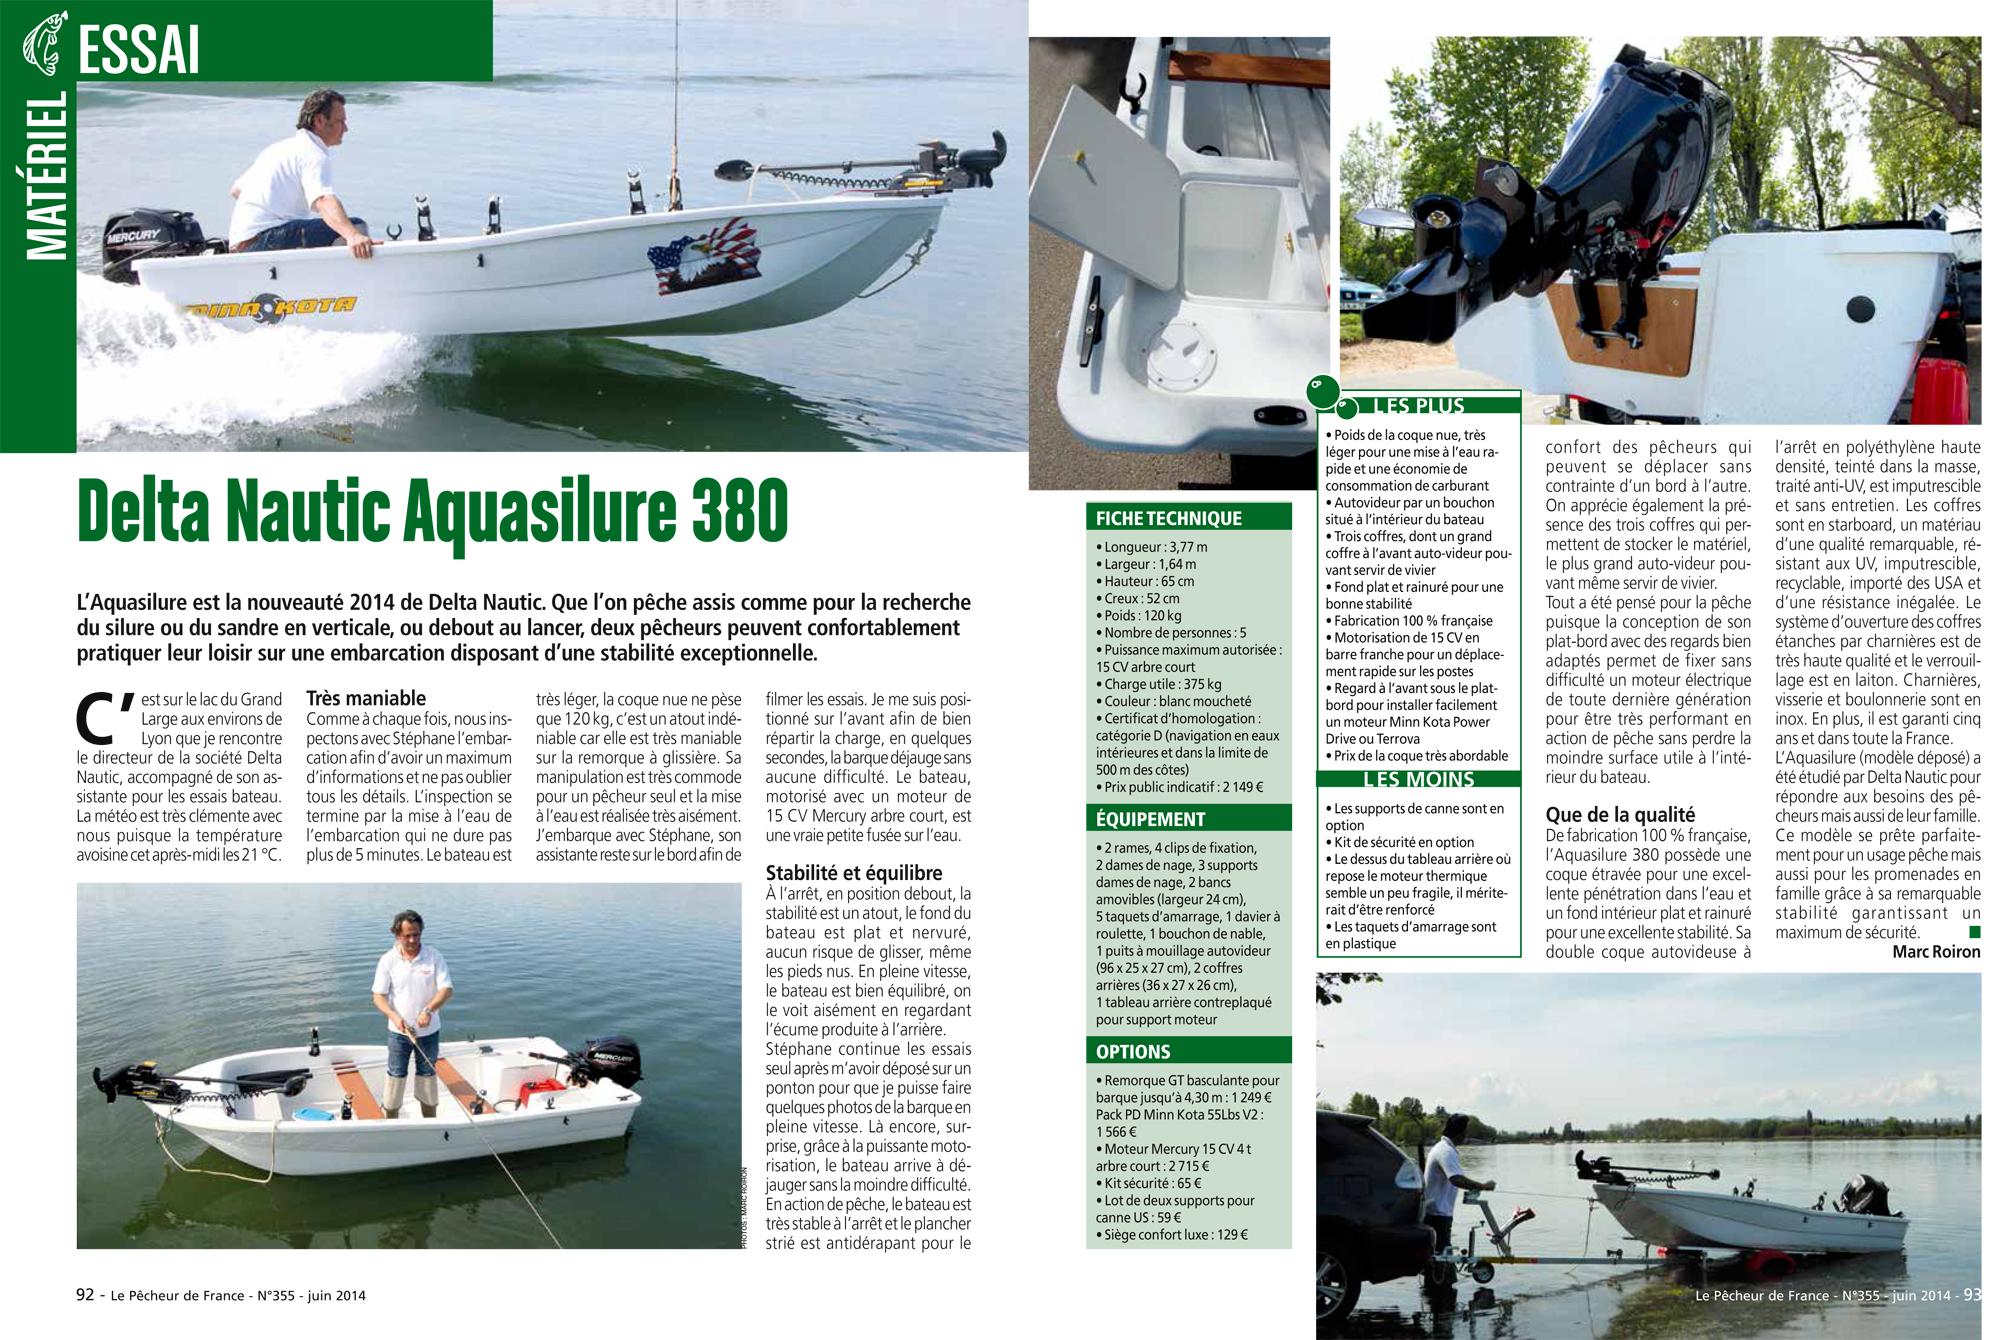 Essai de la barque Aquasilure 380 Delta Nautic